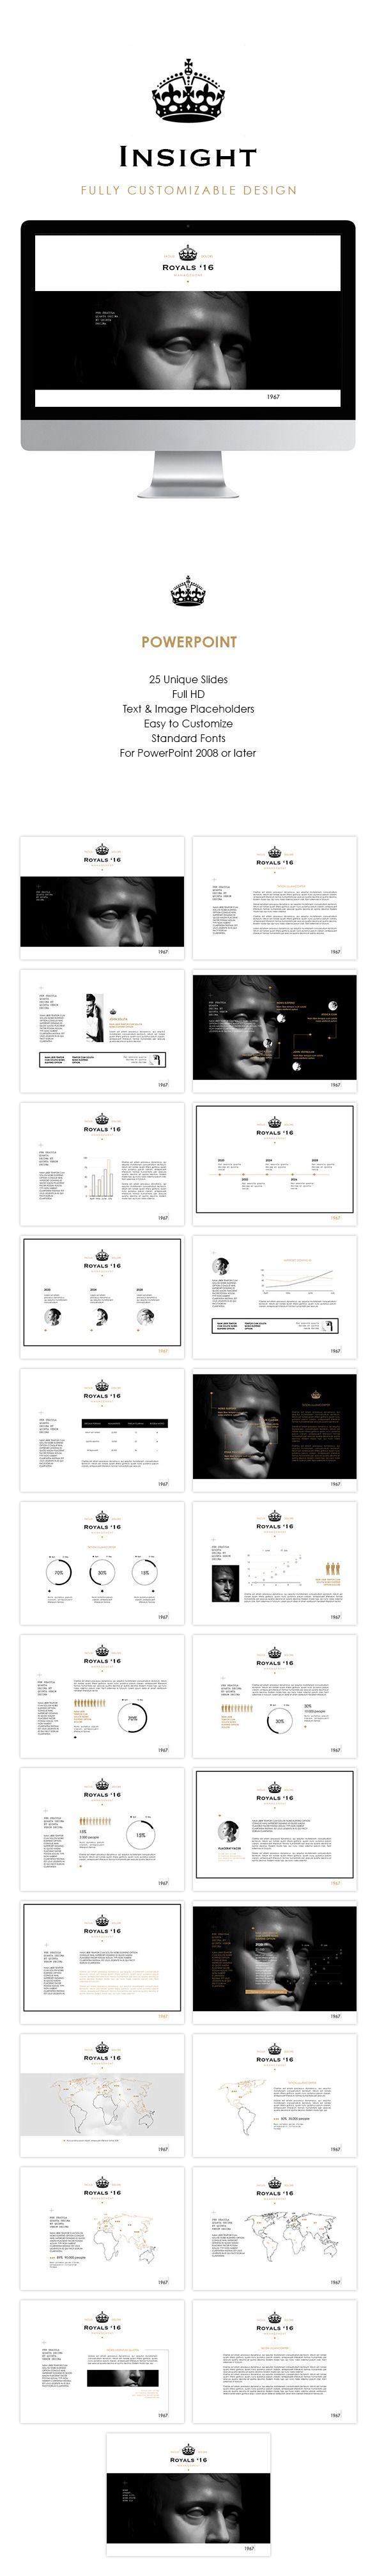 Insight minimalistic PowerPoint presentation Template #design #slides Download: http://graphicriver.net/item/insight/12821366?ref=ksioks